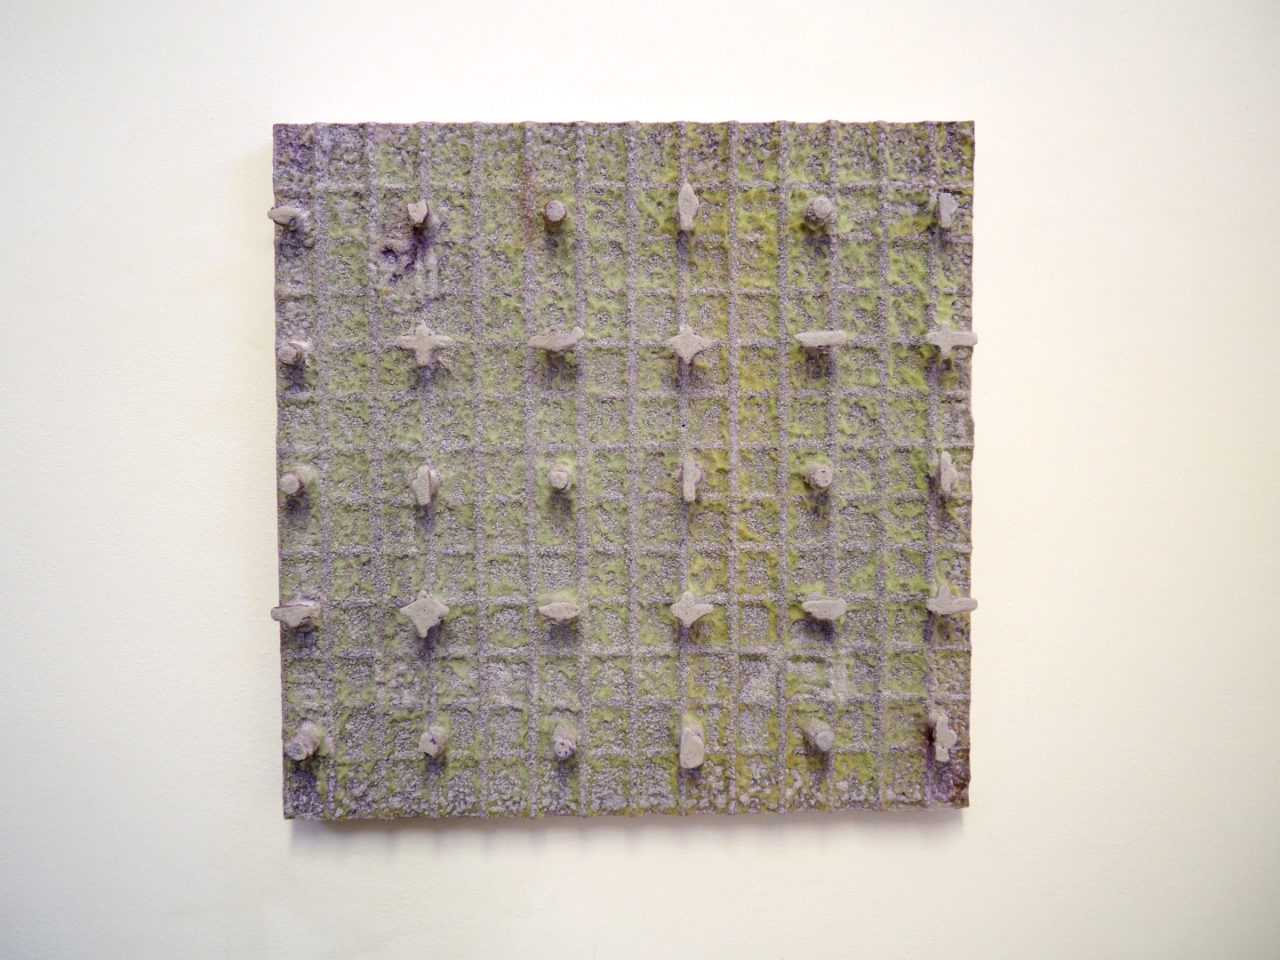 Paul Ahl, Dispersion 30, 2020, Beton, Pigment, Schaumstoff, 53 x 53 x 7 cm